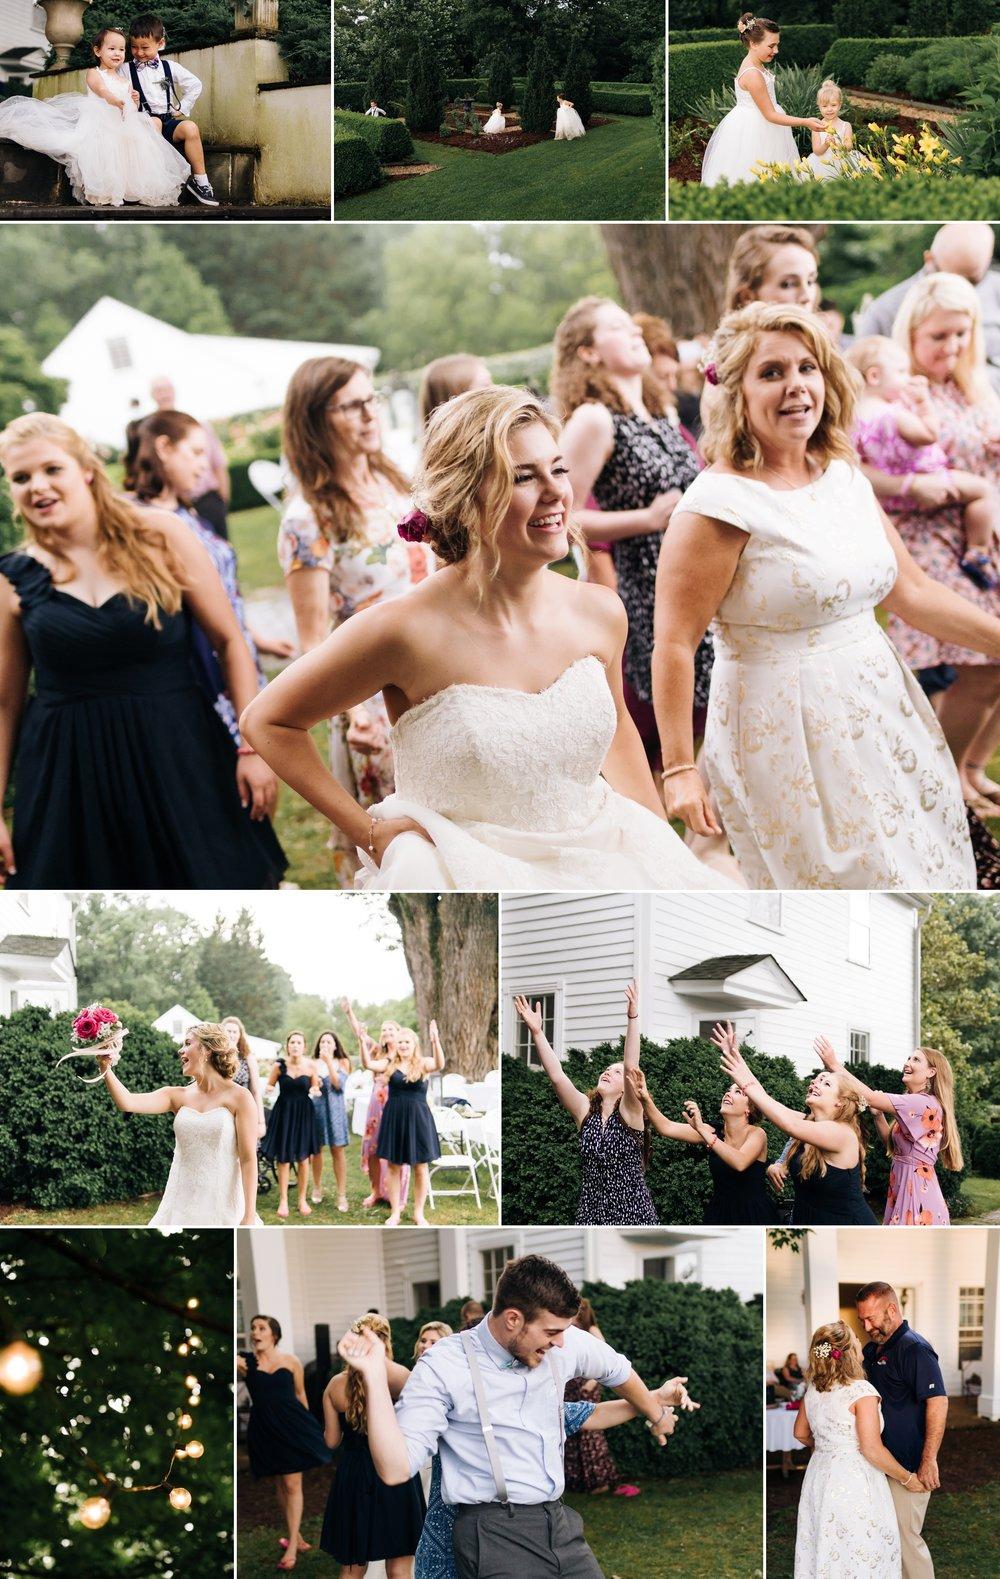 elegant private estate spring wedding claytor nature study center bedford lynchburg va jonathan hannah photography.jpg